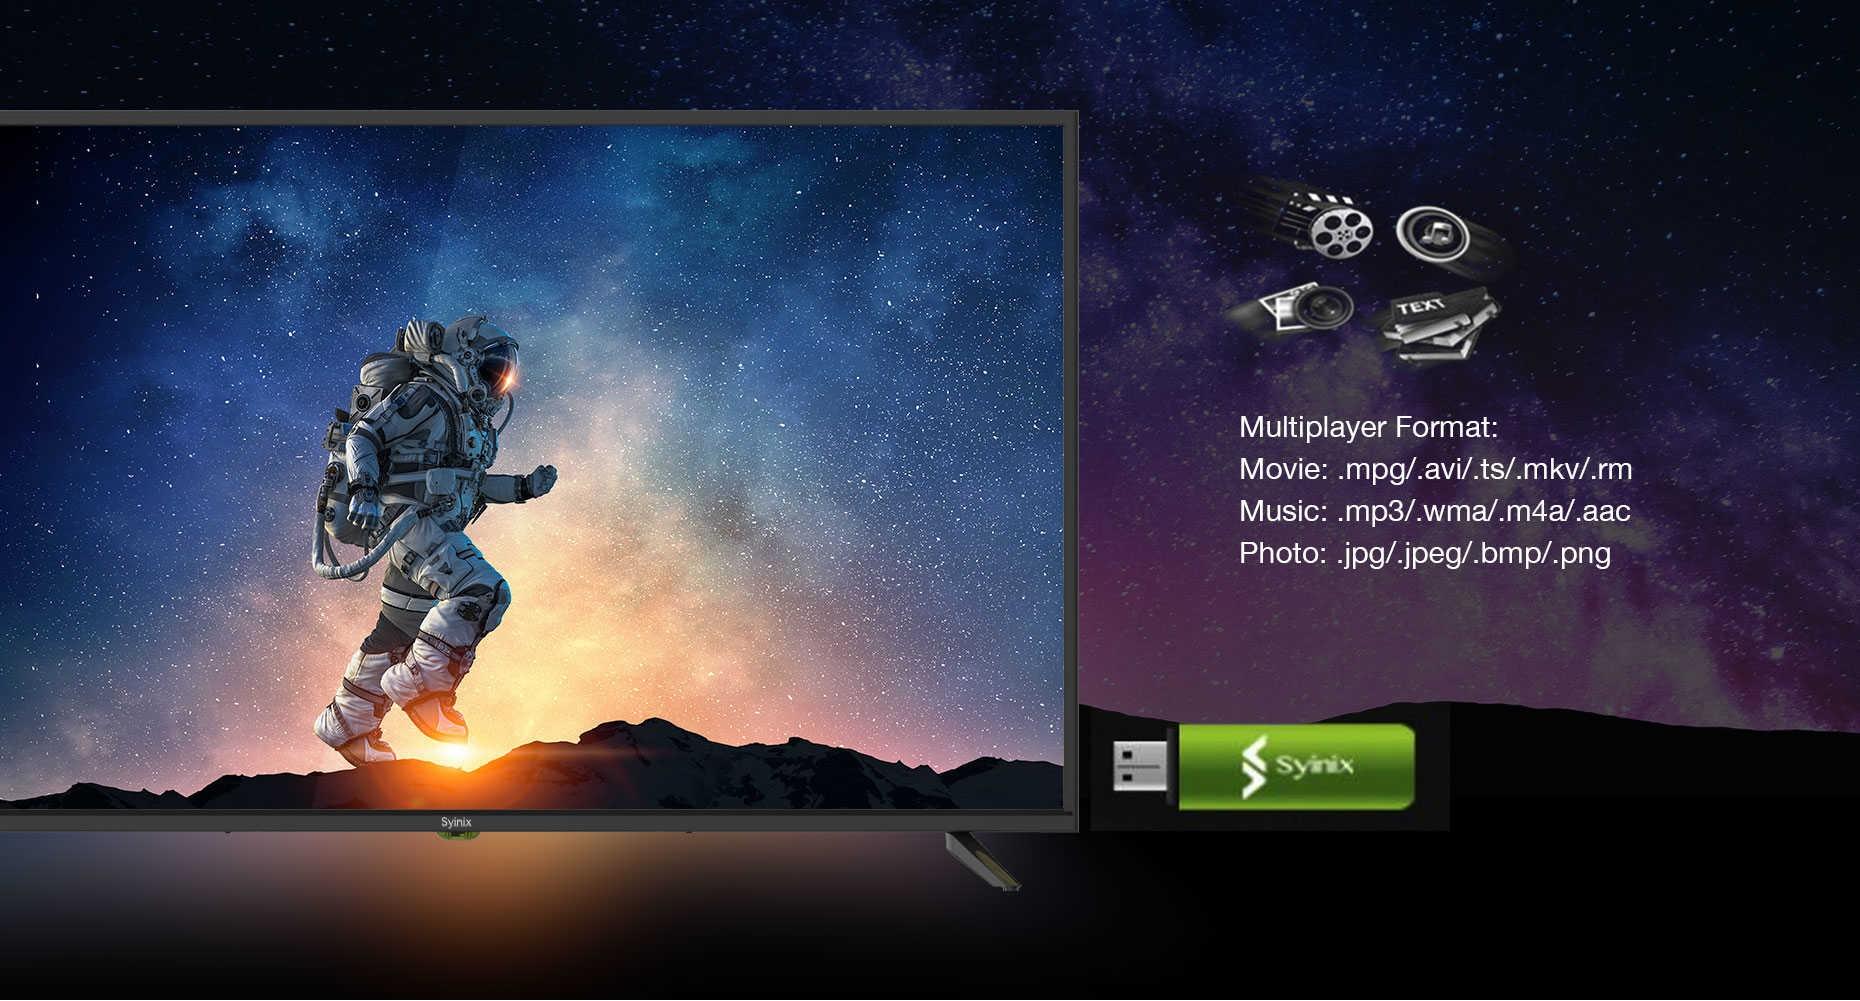 syinix frameless tv